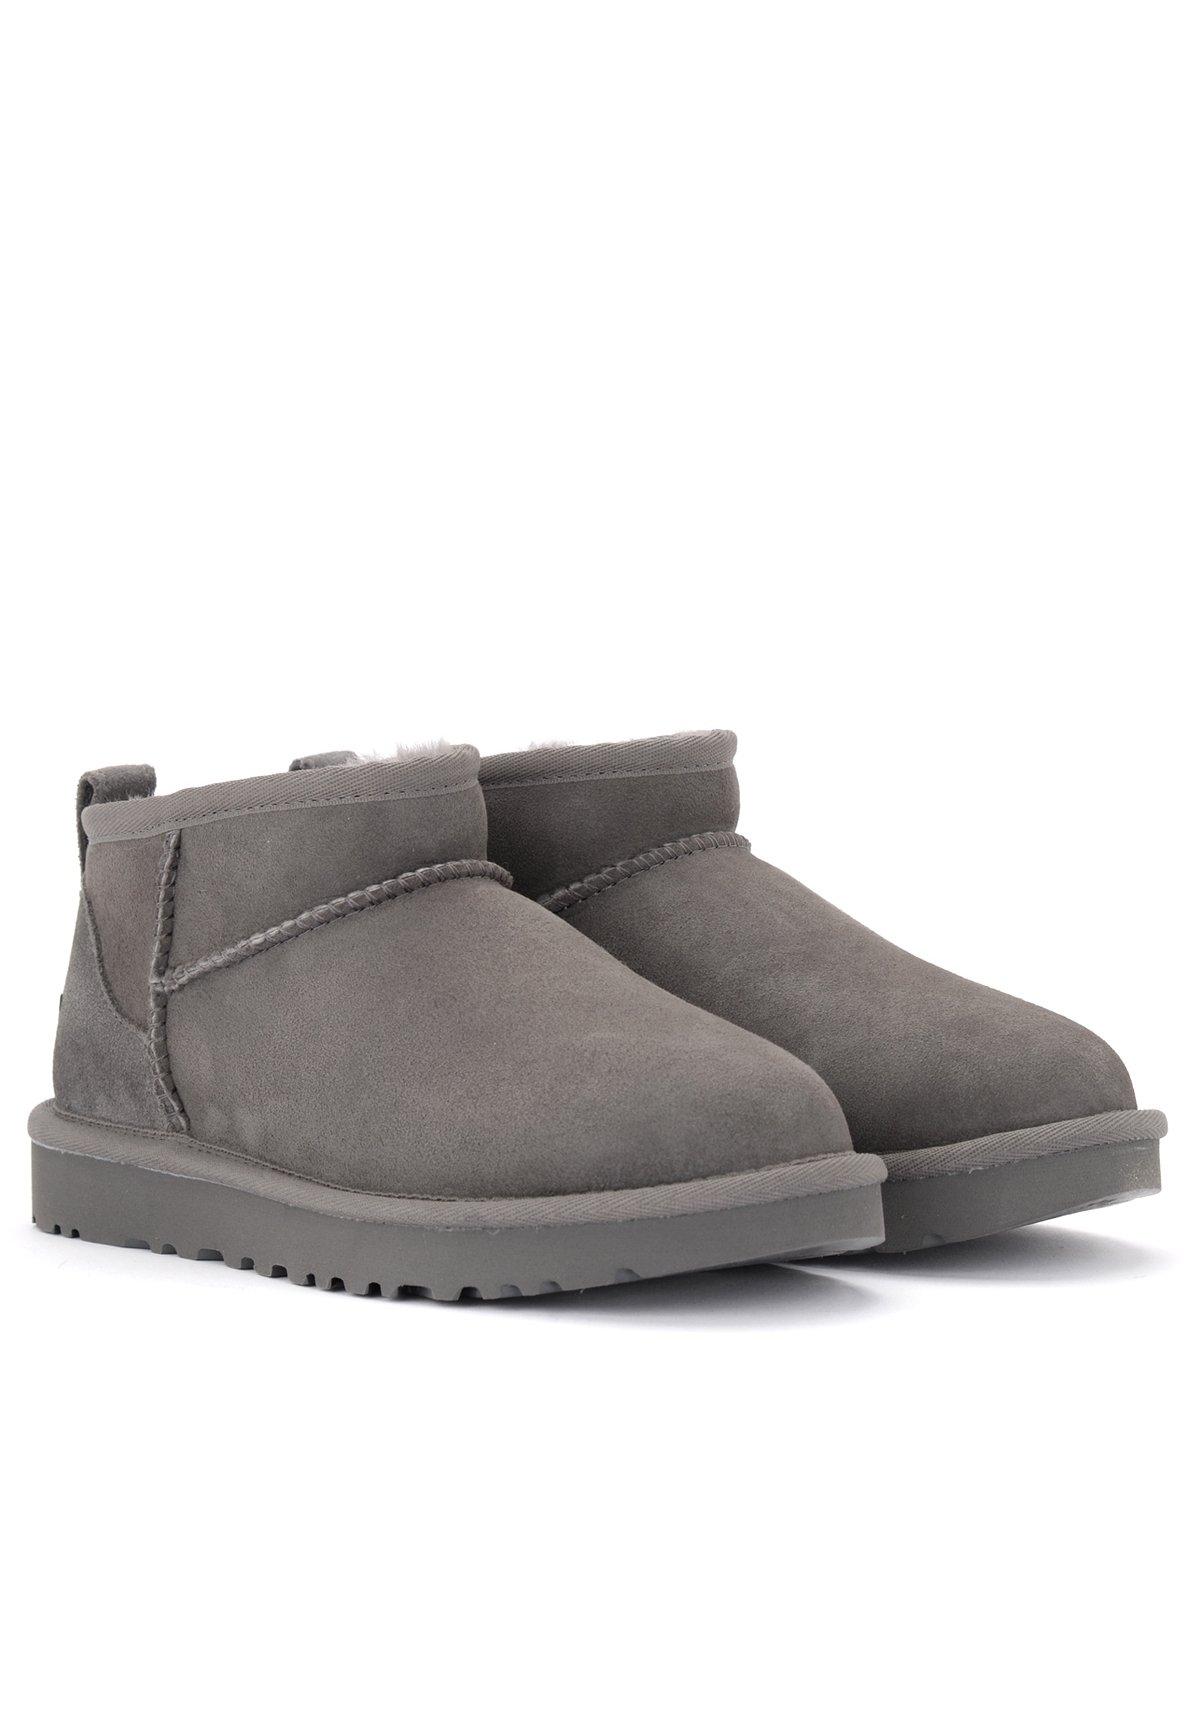 UGG Ankle Boot grigio/grau